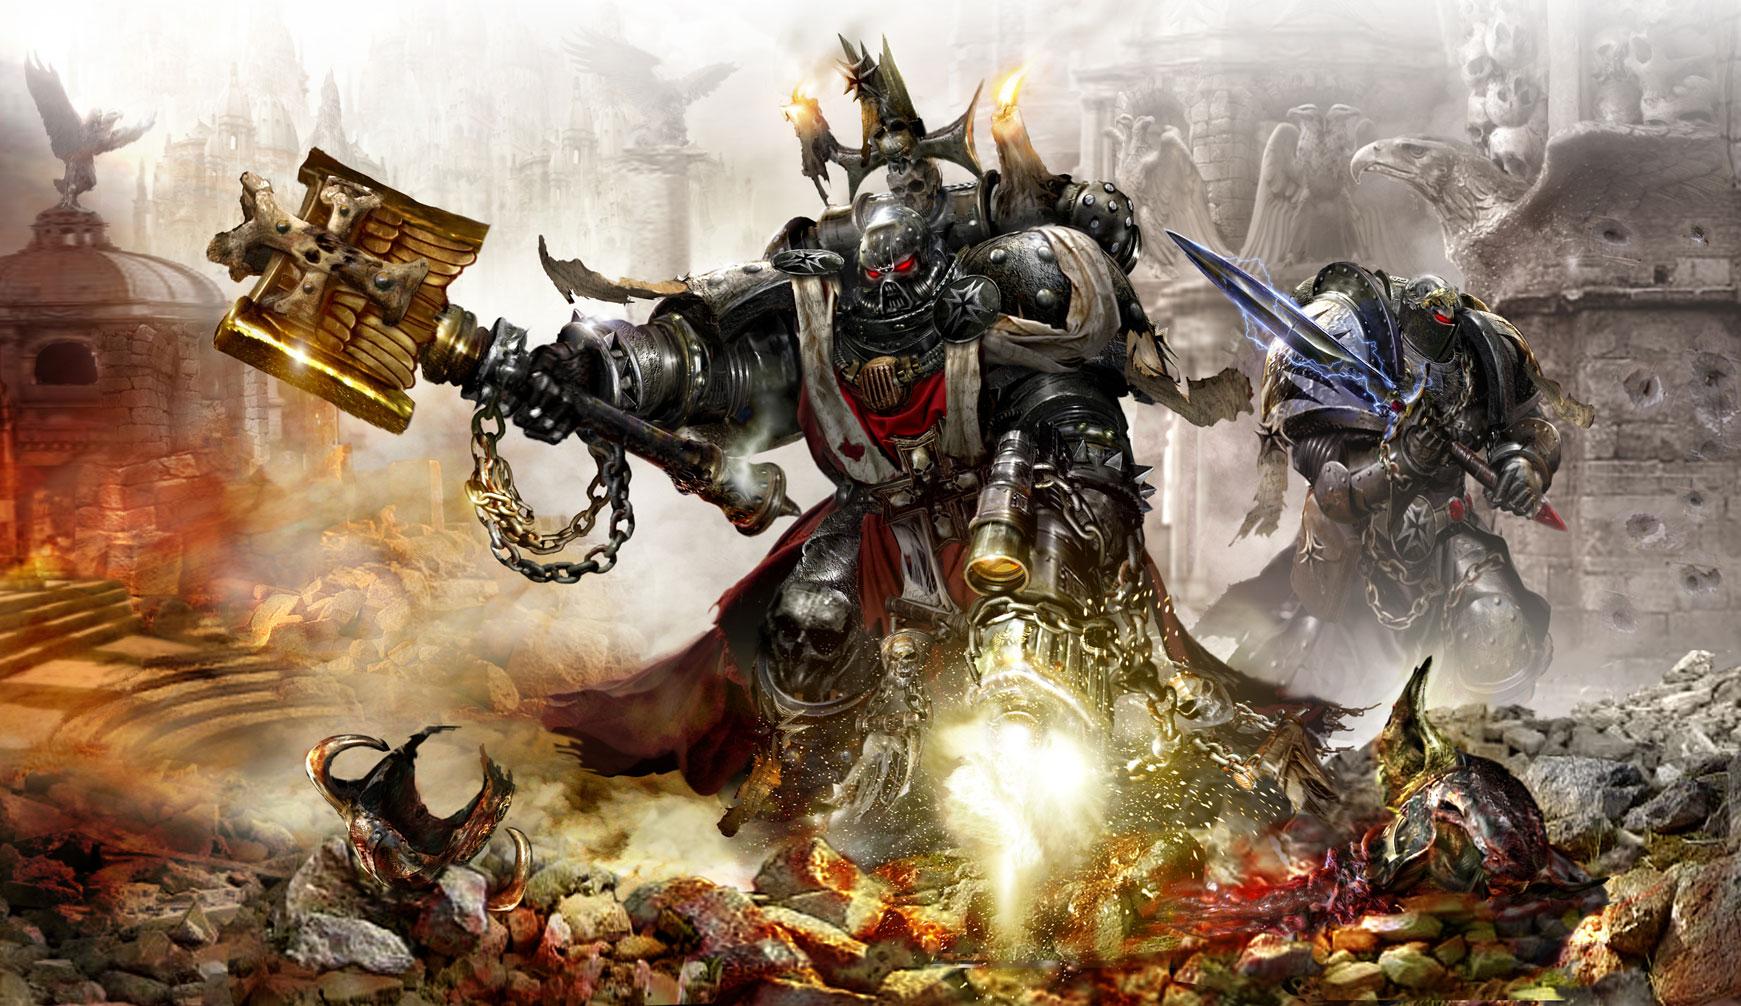 Warhammer 40k death company wallpaper - Chaplains In Battle